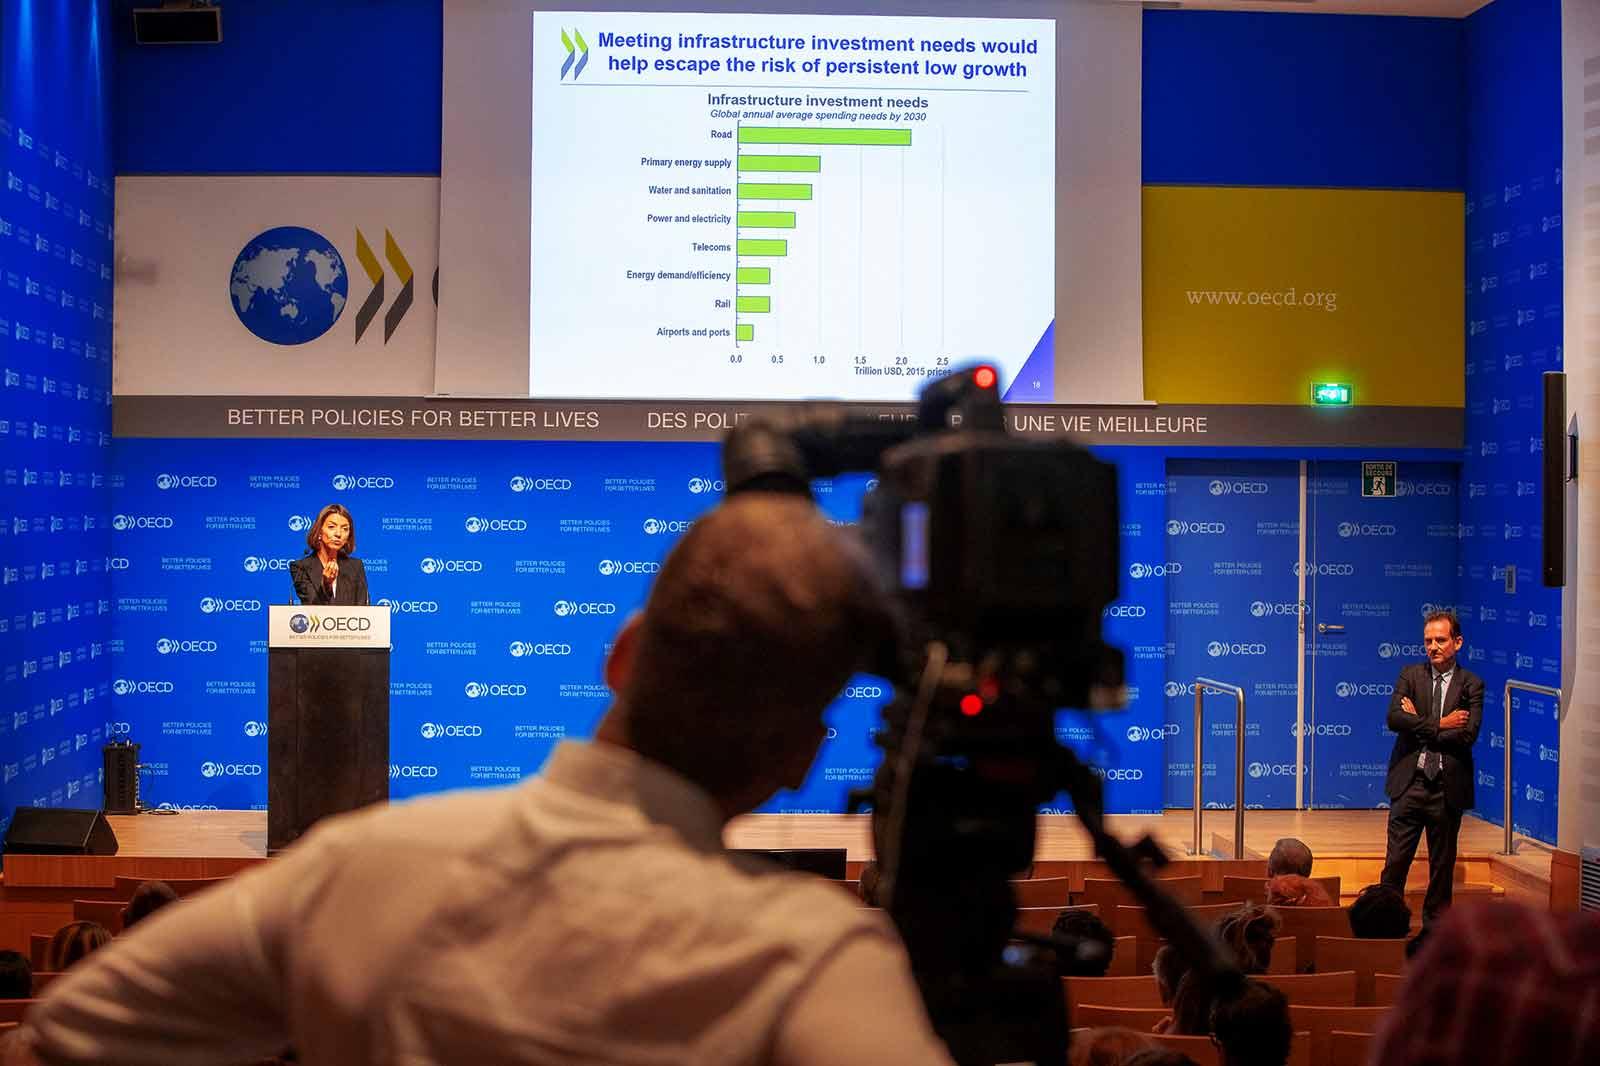 ECD Chief Economist Laurence Boone OECD